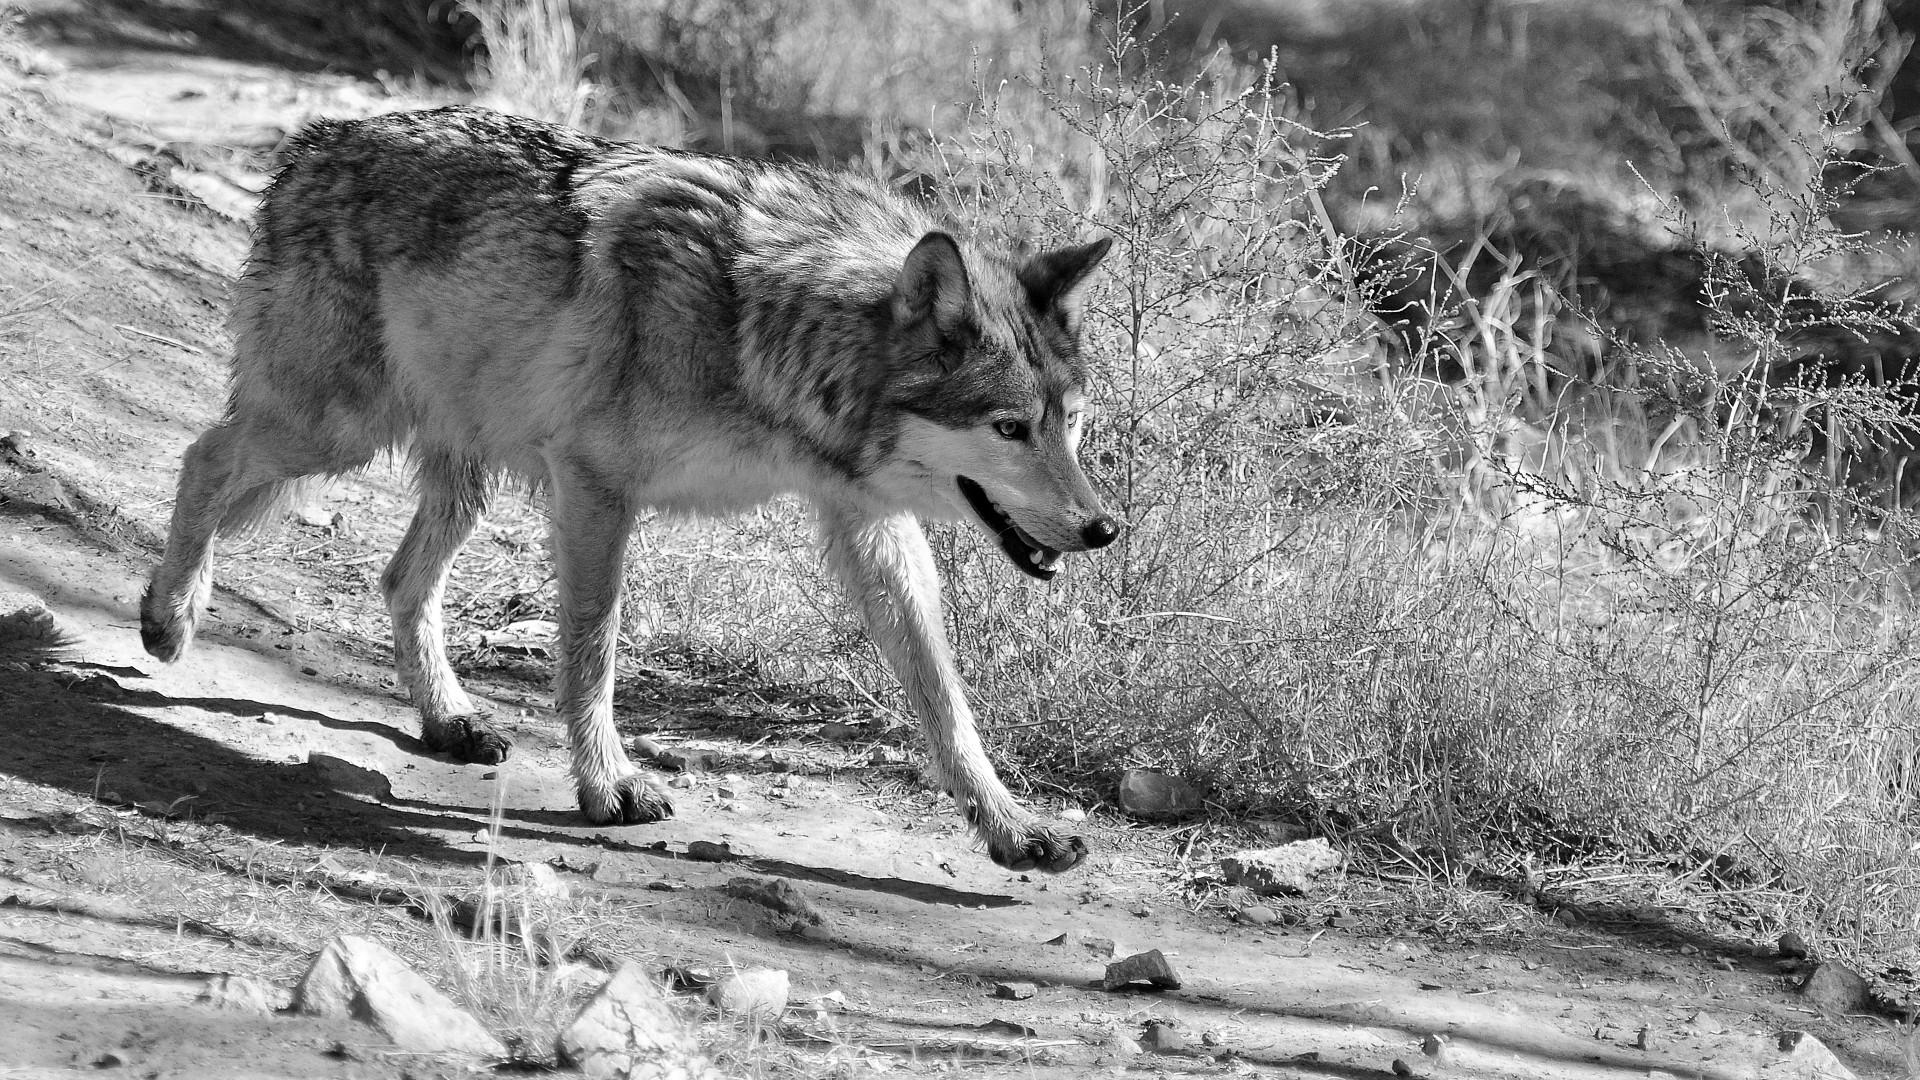 Mexcian gray wolf